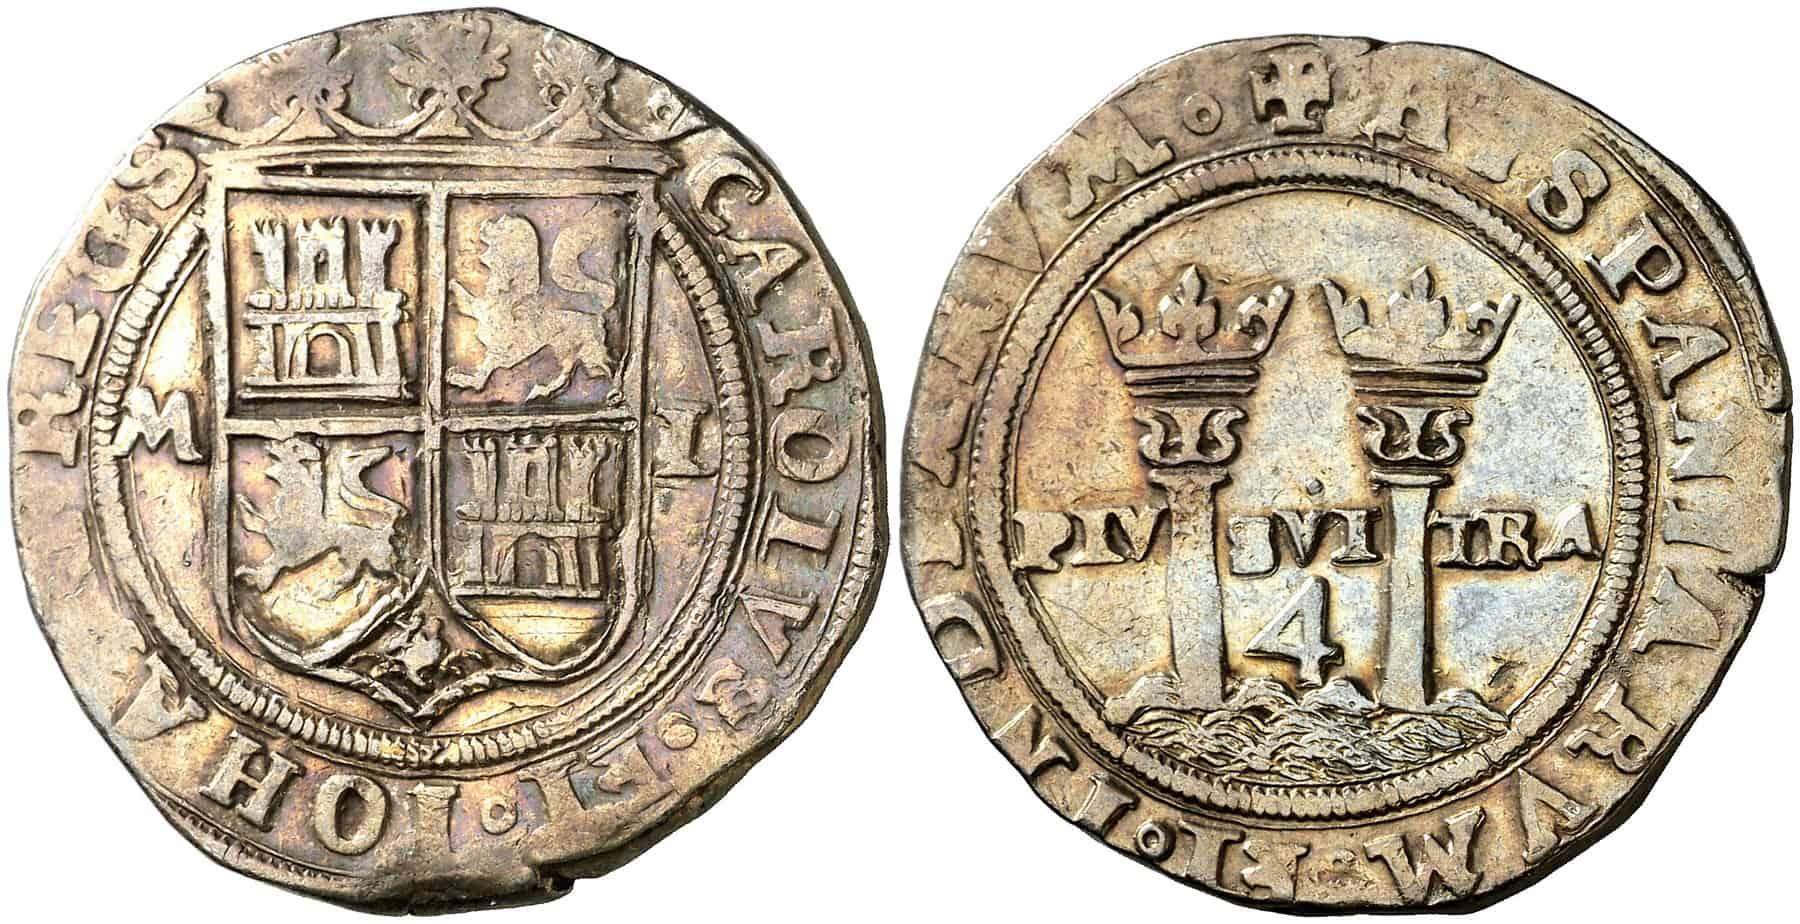 Imagen 13. 4 reales México